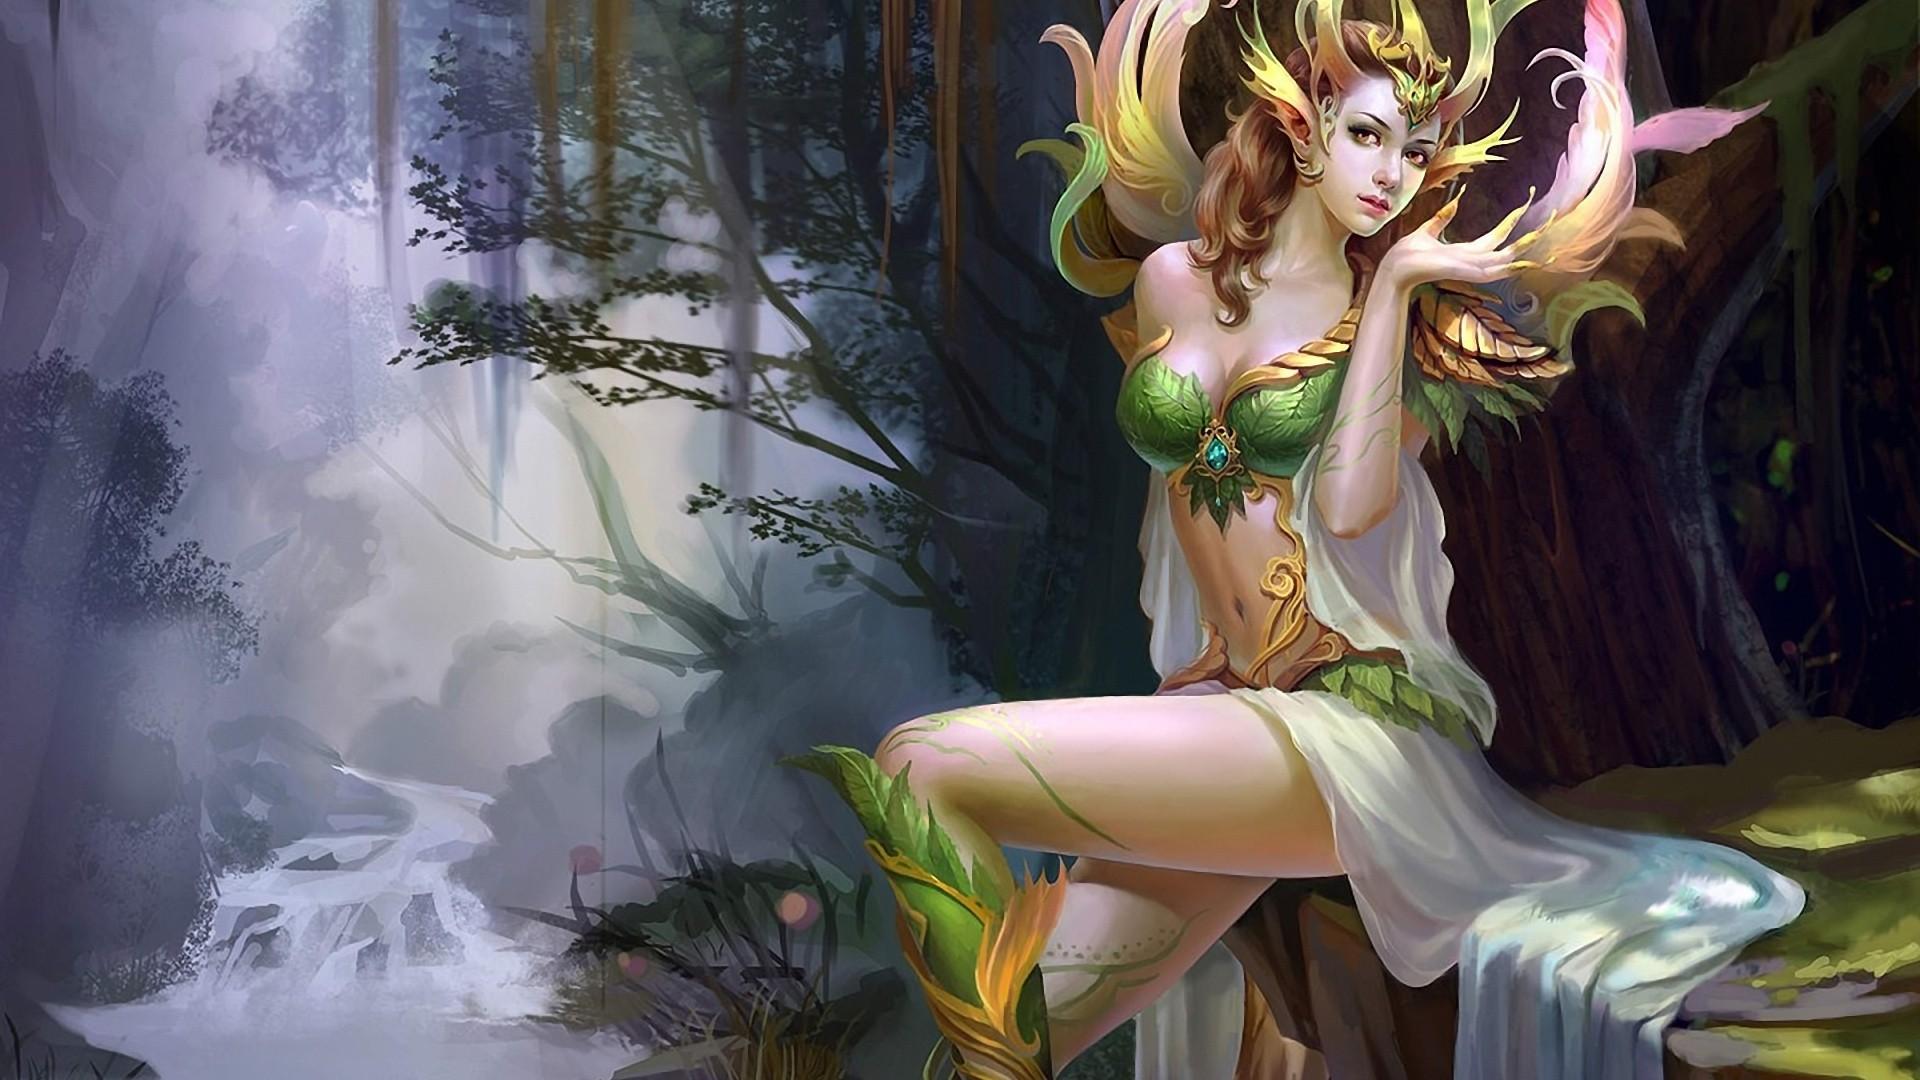 Fairy a wallpaper